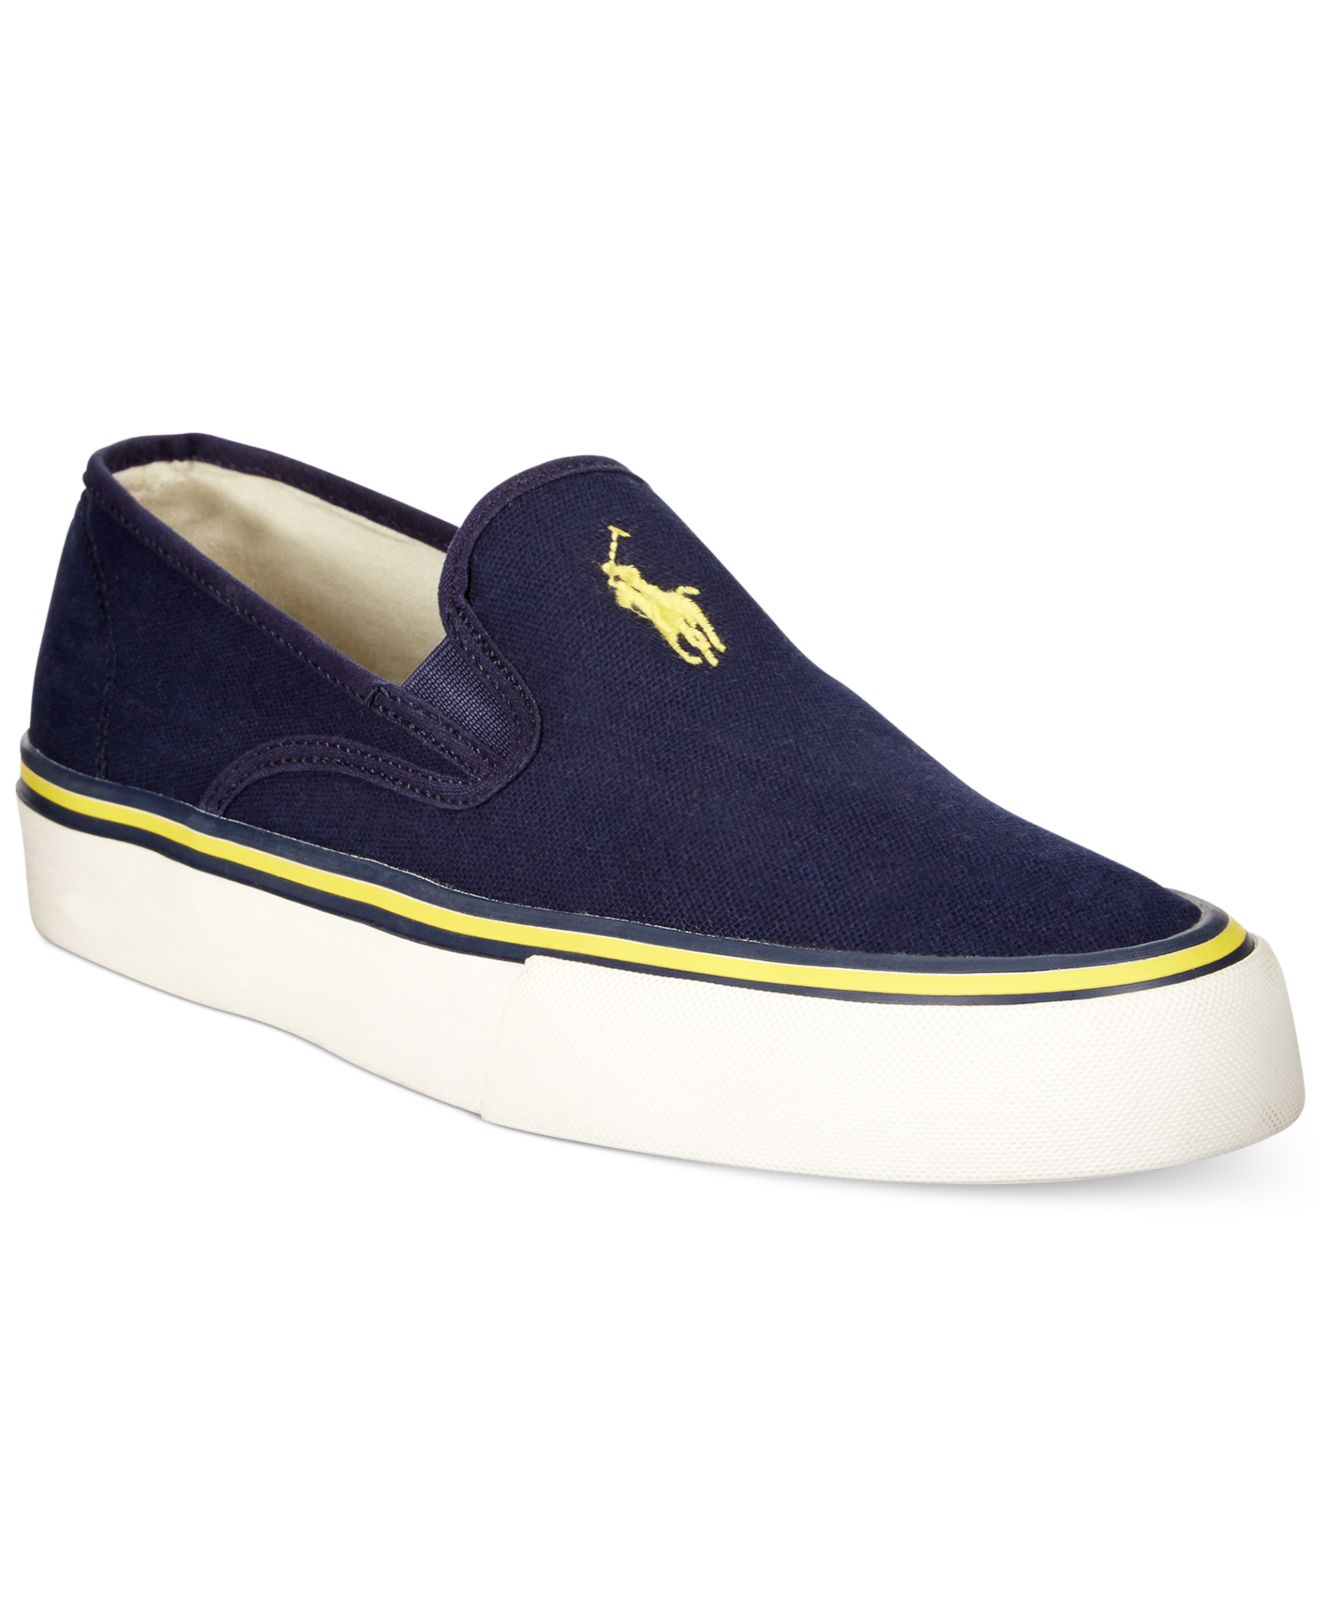 lyst polo ralph lauren mytton slip on sneakers in blue for men. Black Bedroom Furniture Sets. Home Design Ideas